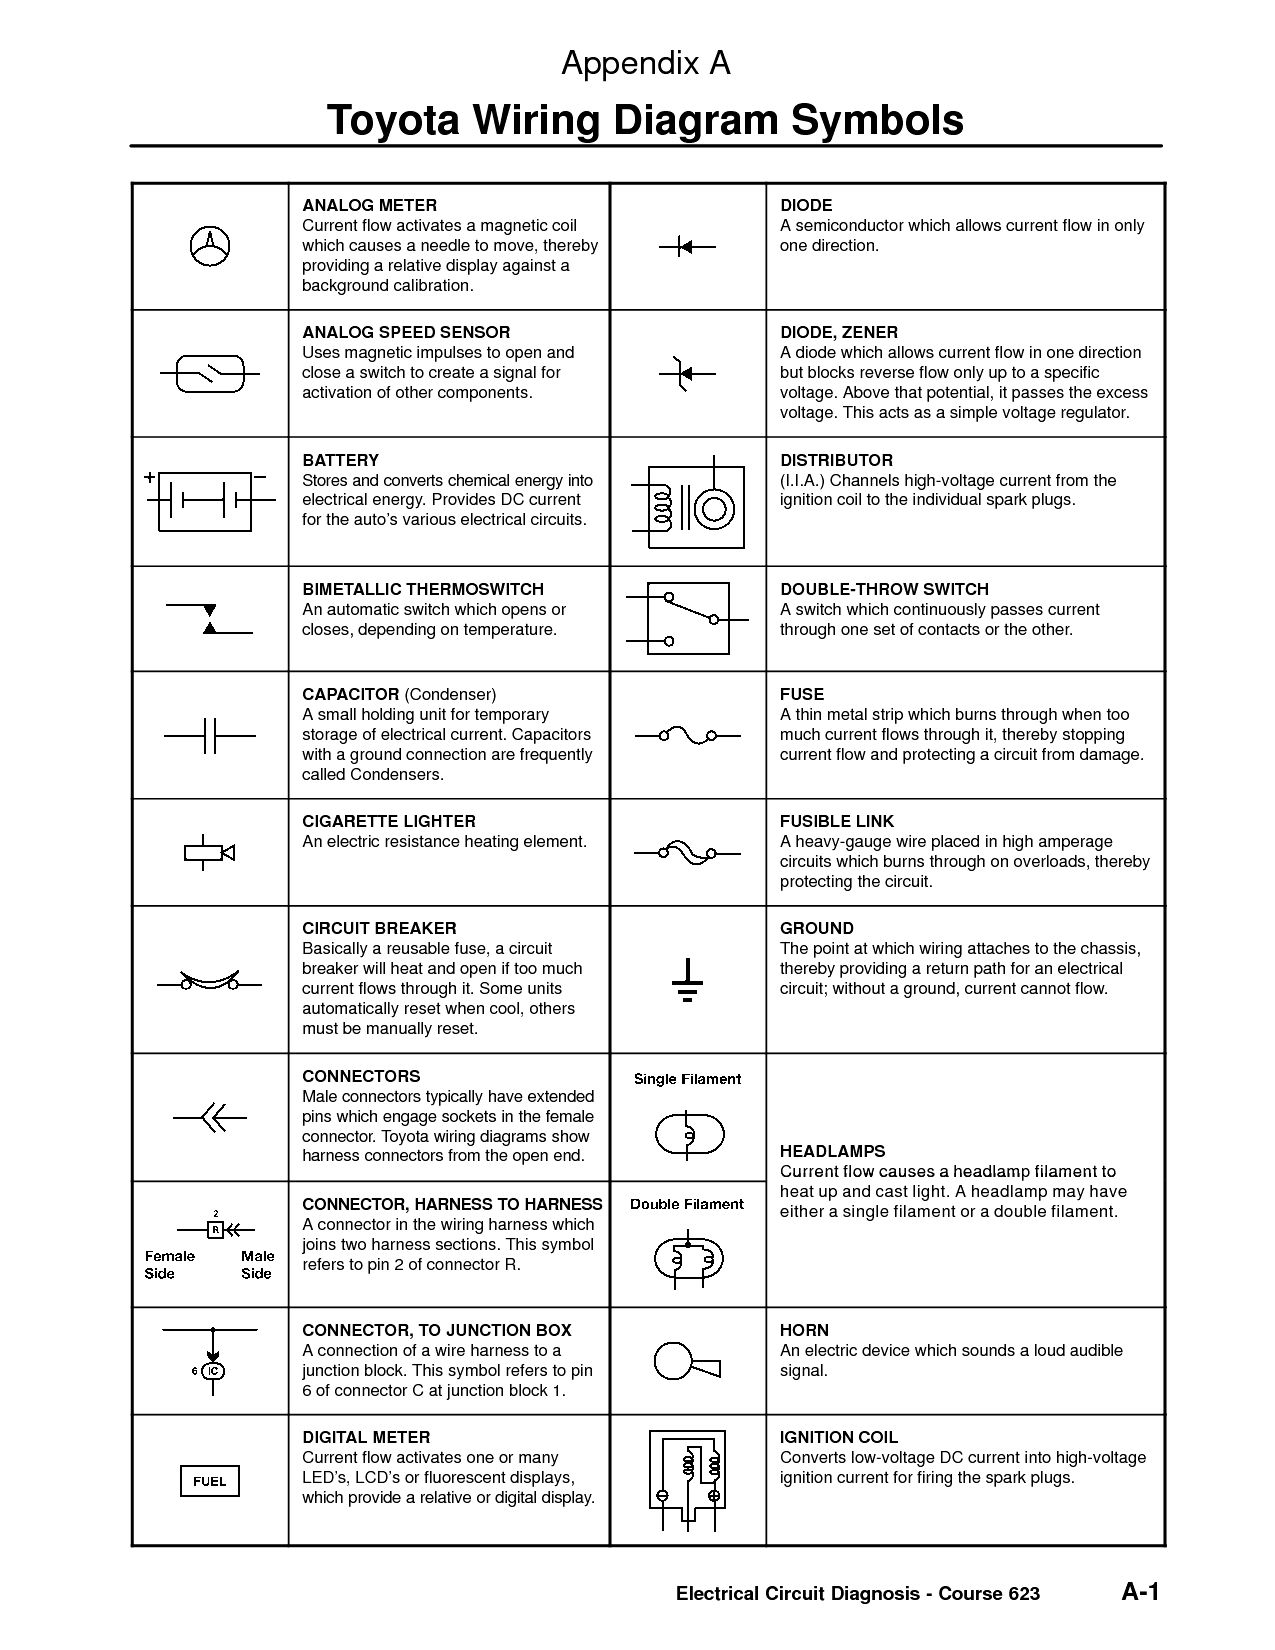 Surprising Electrical Wiring Schematic Symbols Basic Electronics Wiring Diagram Wiring Cloud Gufailluminateatxorg